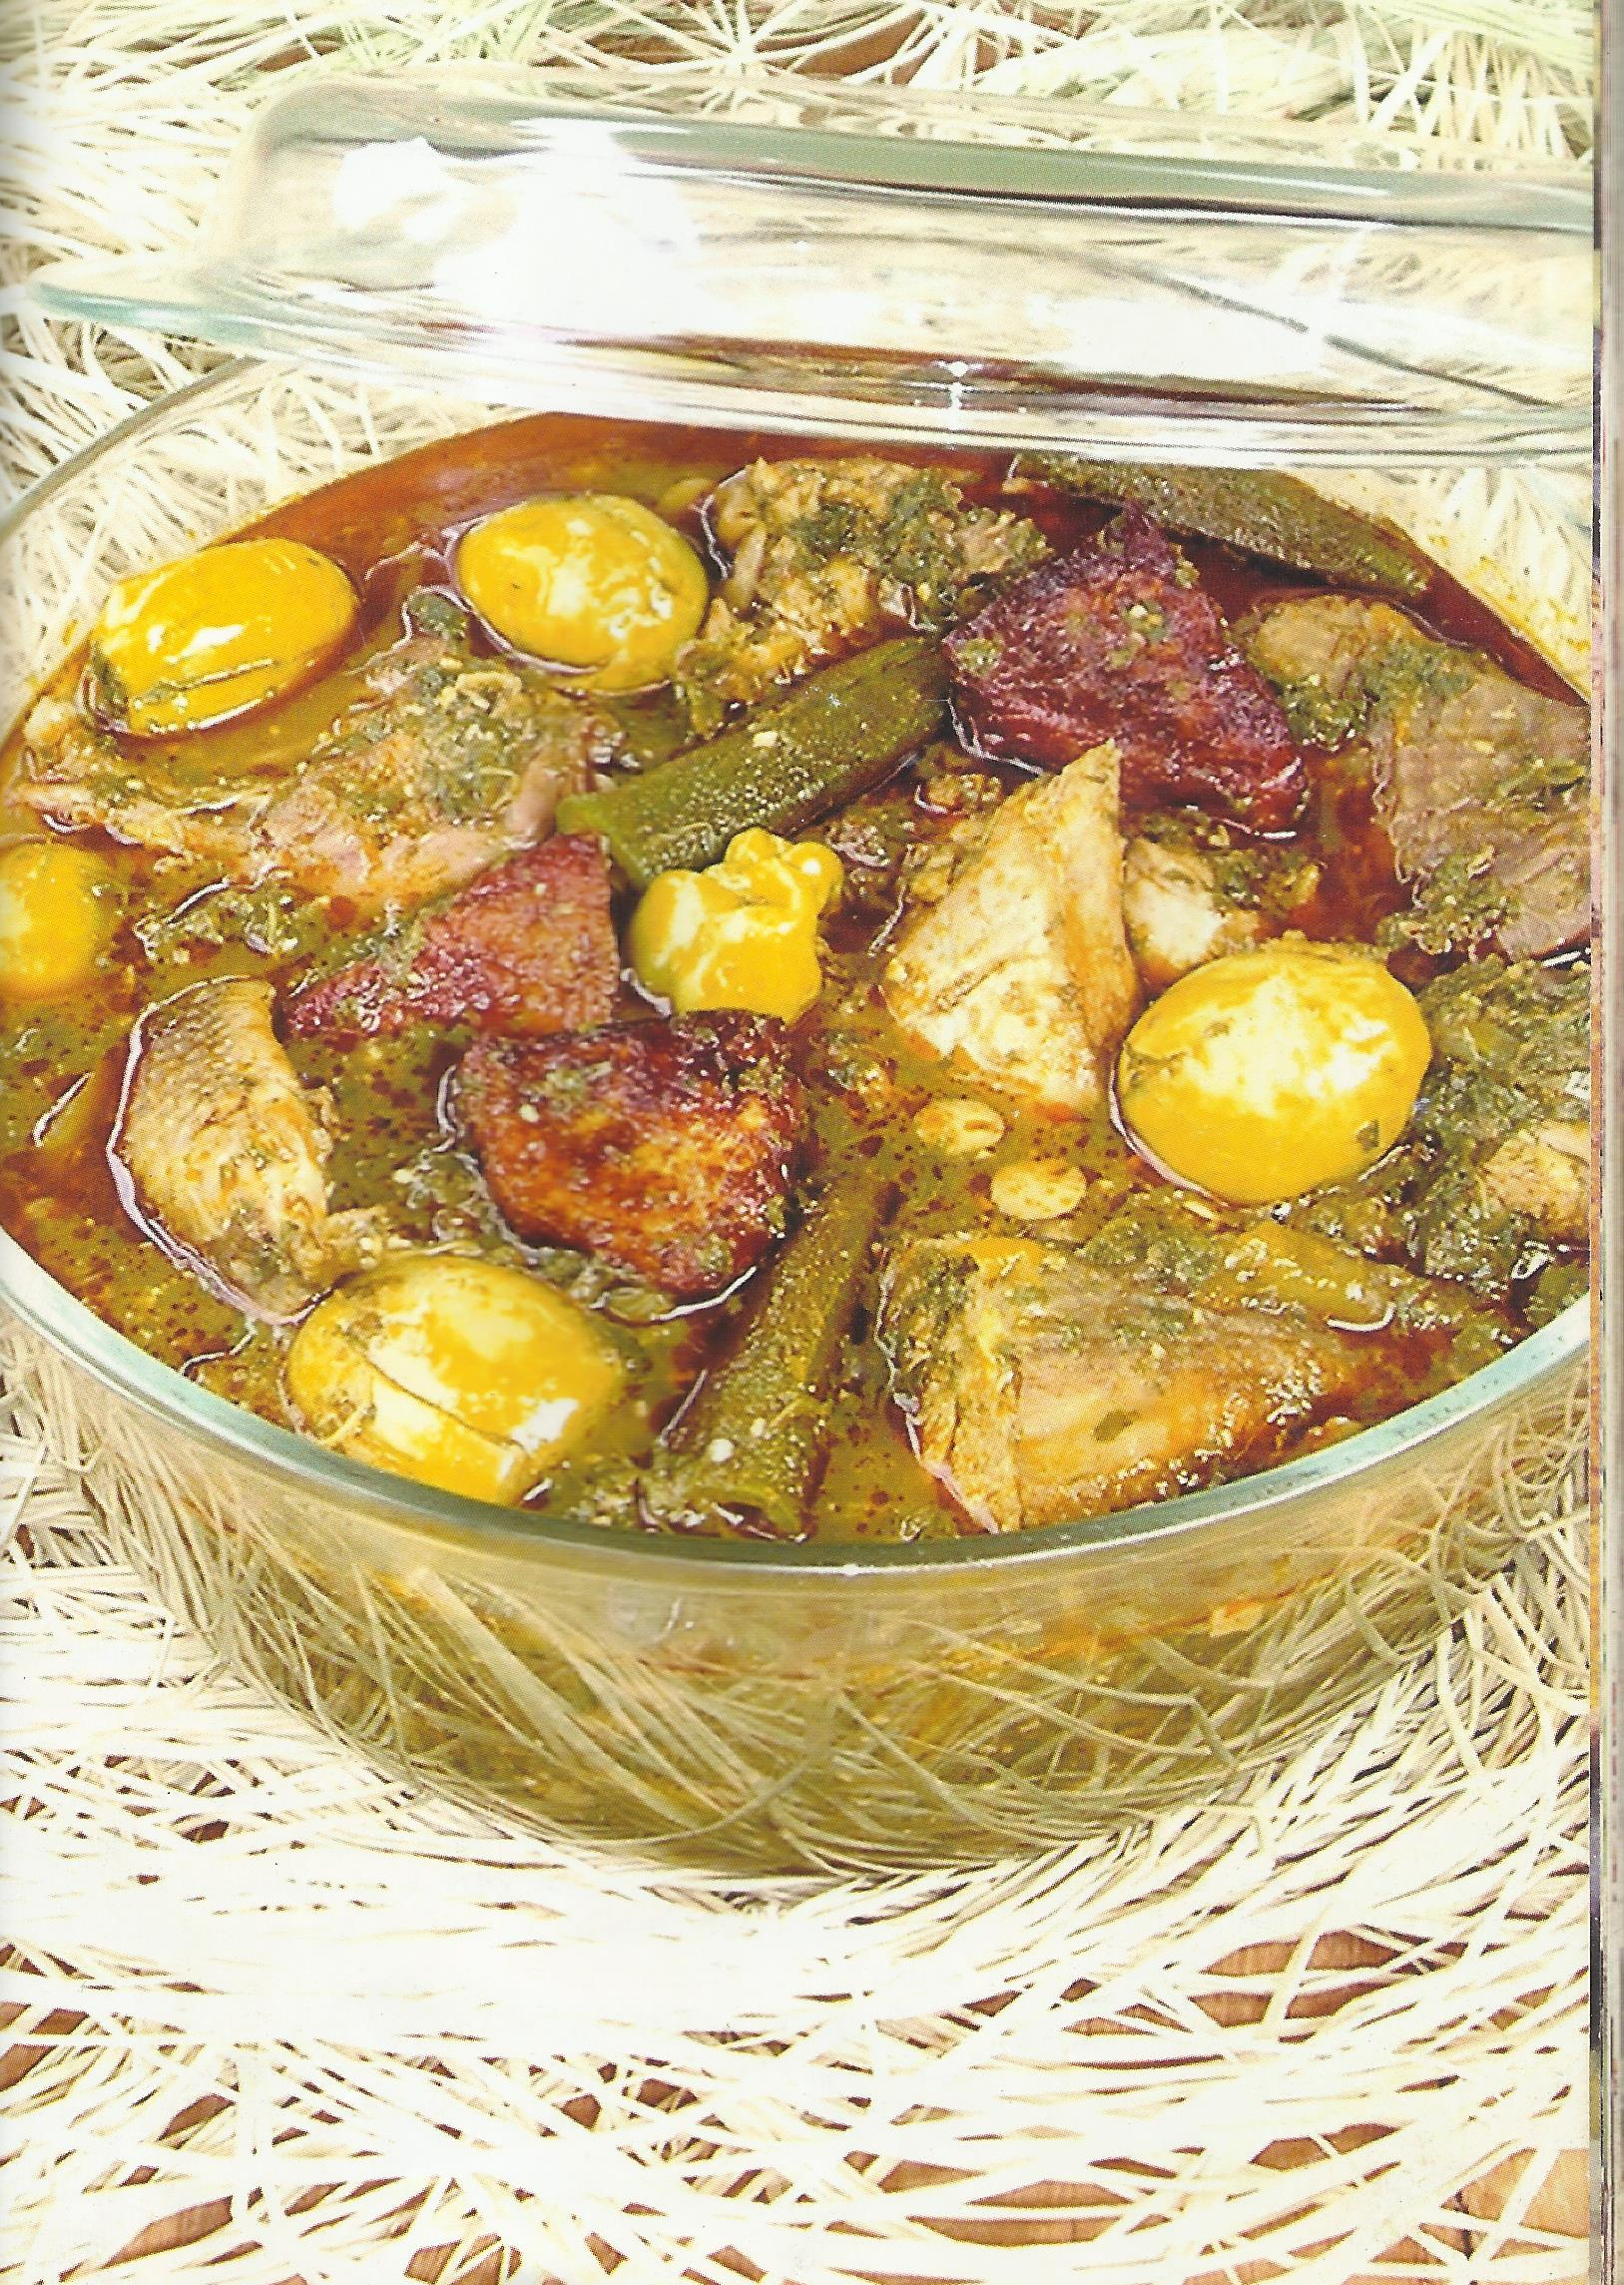 Le r gal gourmand p tisserie cuisine restauration - Formation cuisine patisserie ...